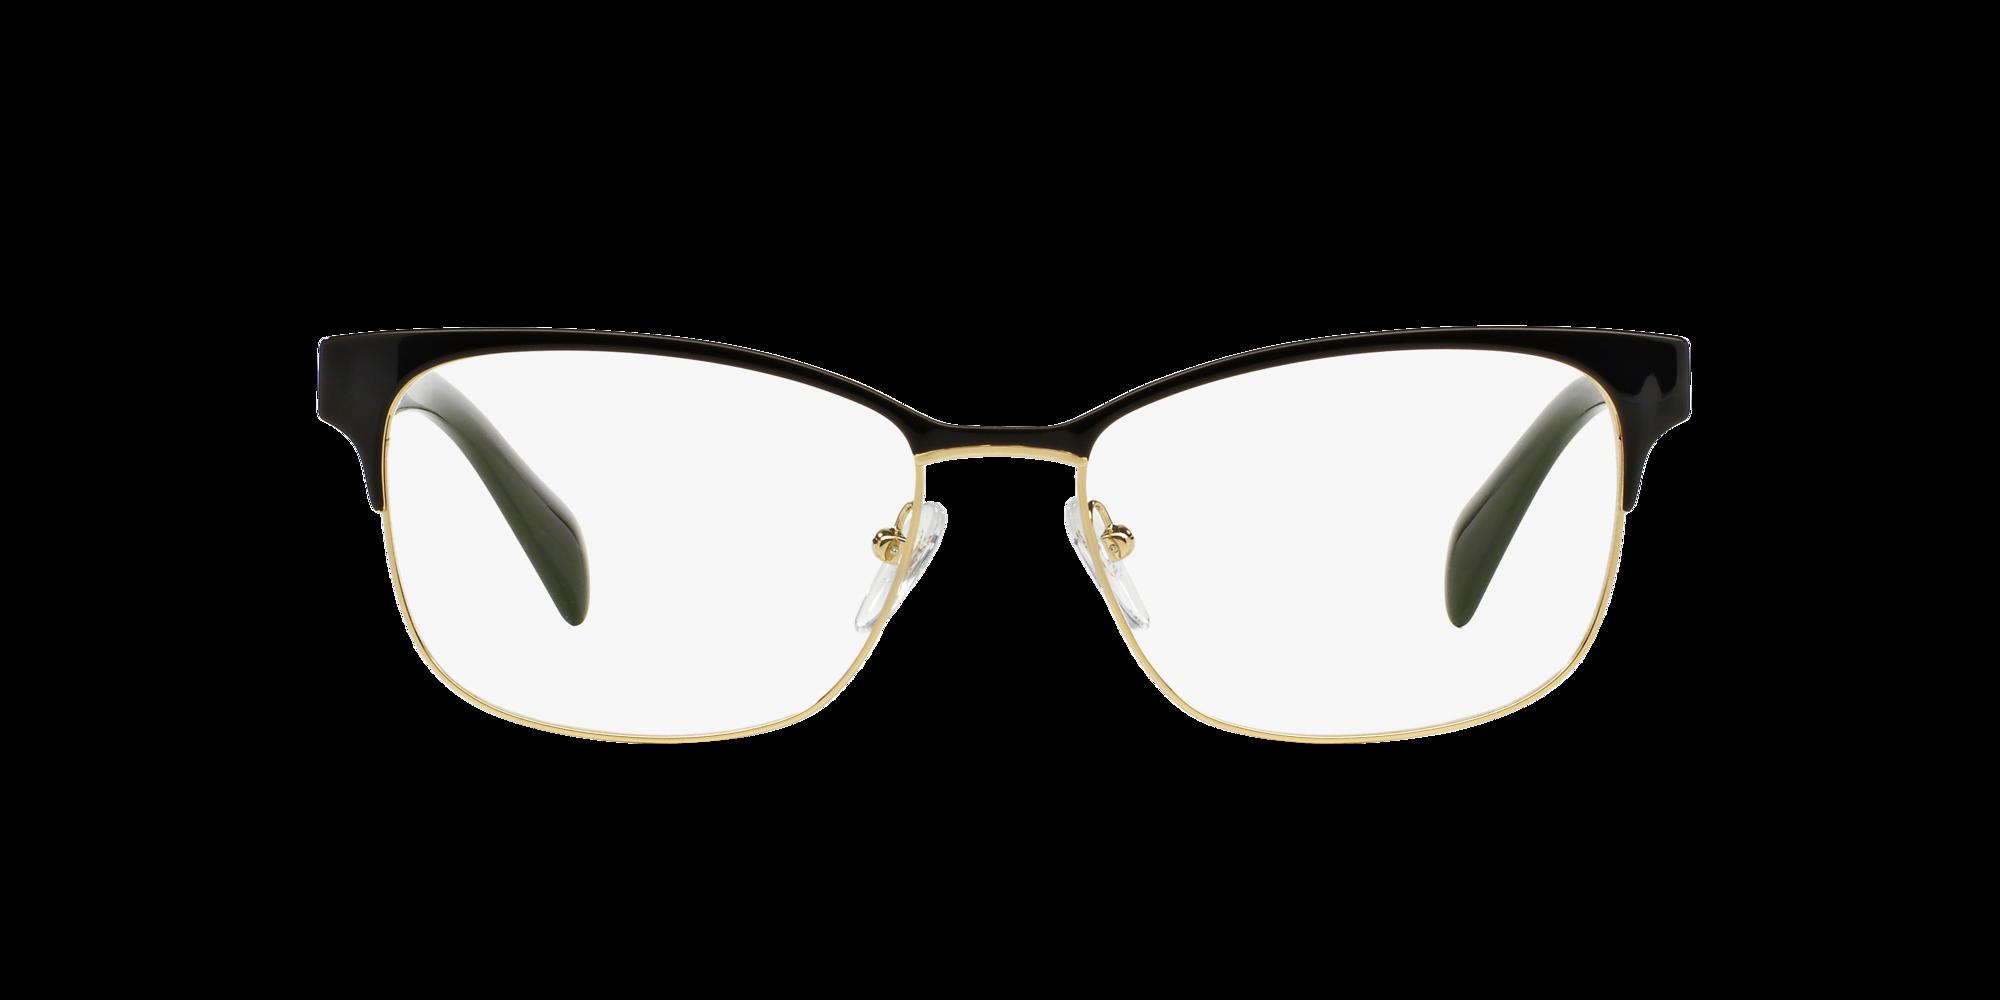 Image for PR 65RV from LensCrafters | Glasses, Prescription Glasses Online, Eyewear